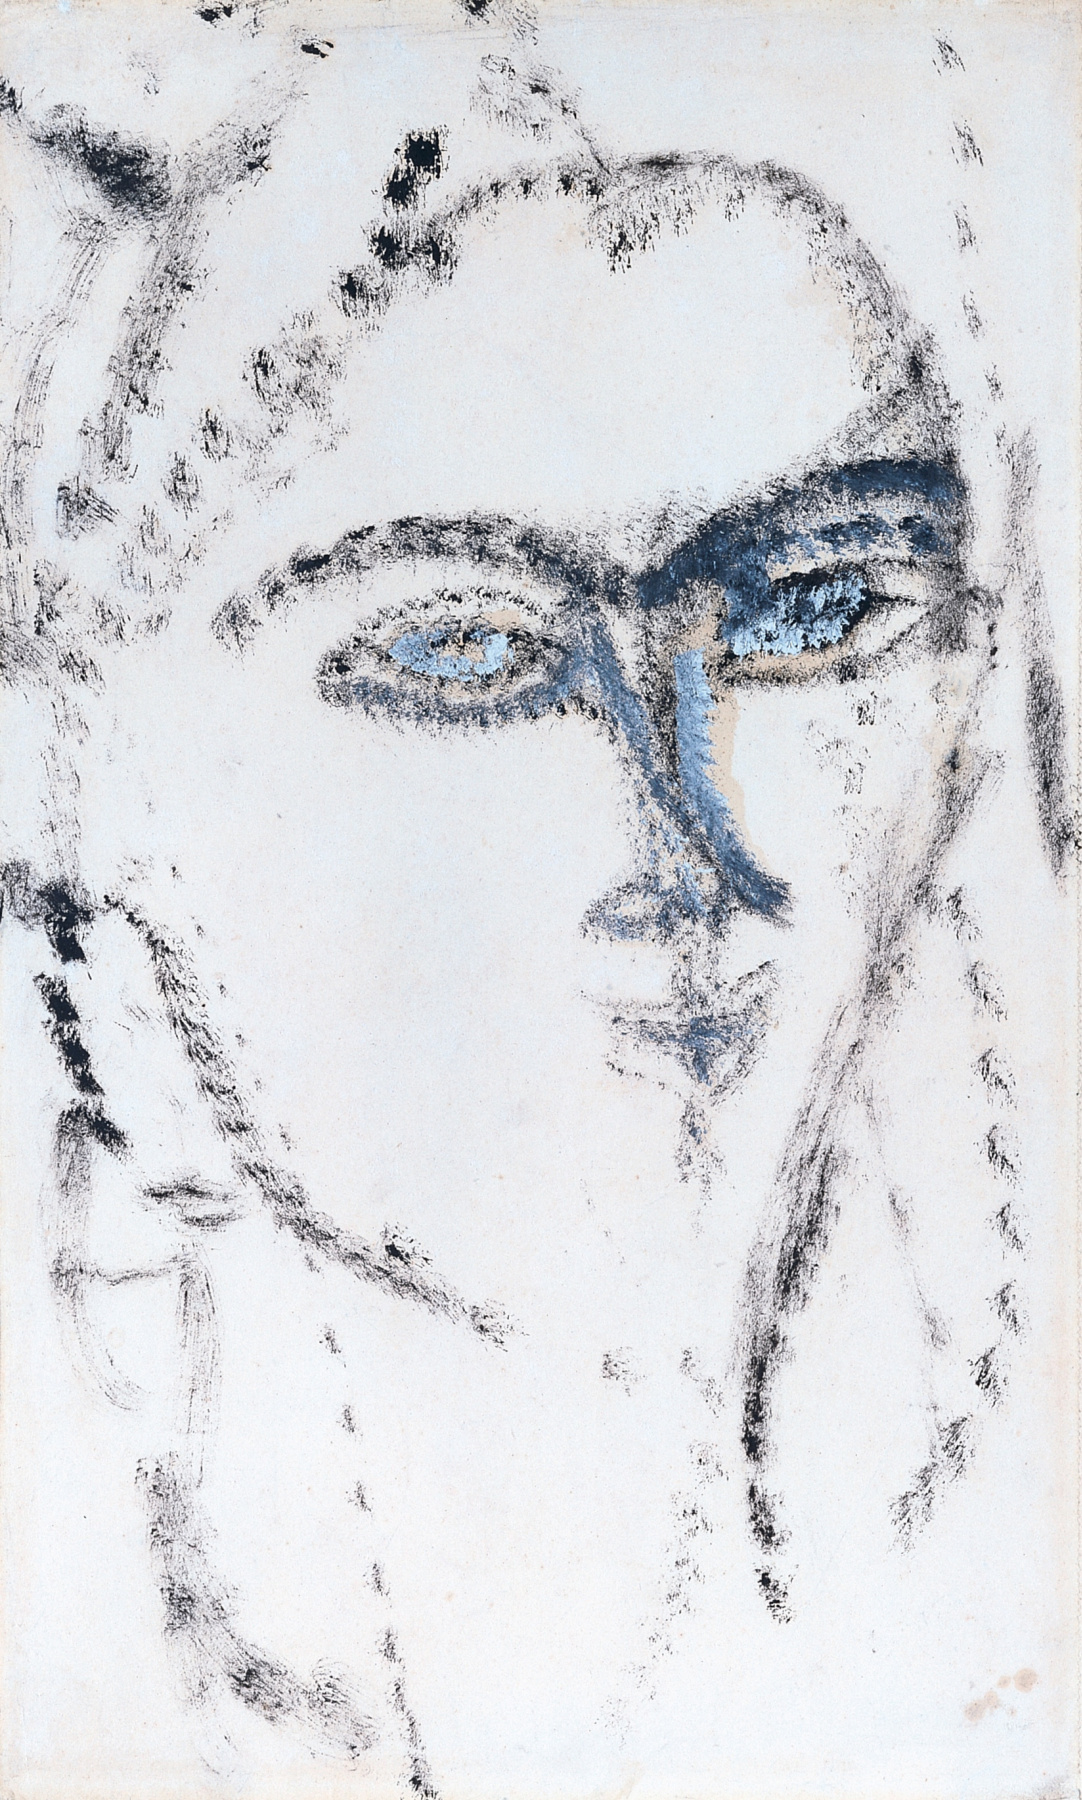 Amedeo Modigliani. The woman's face